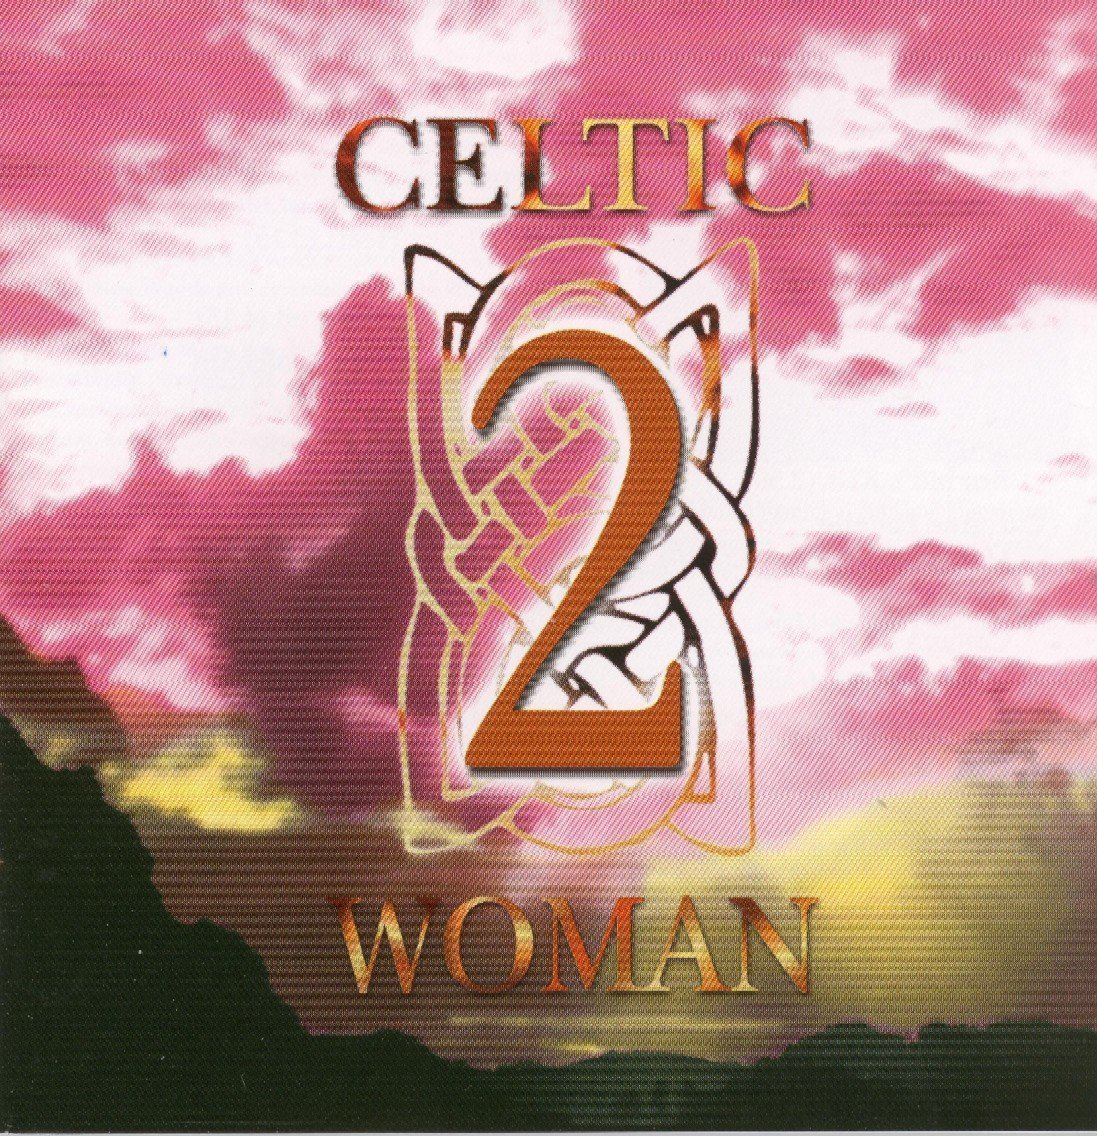 Celtic Woman, Vol 2